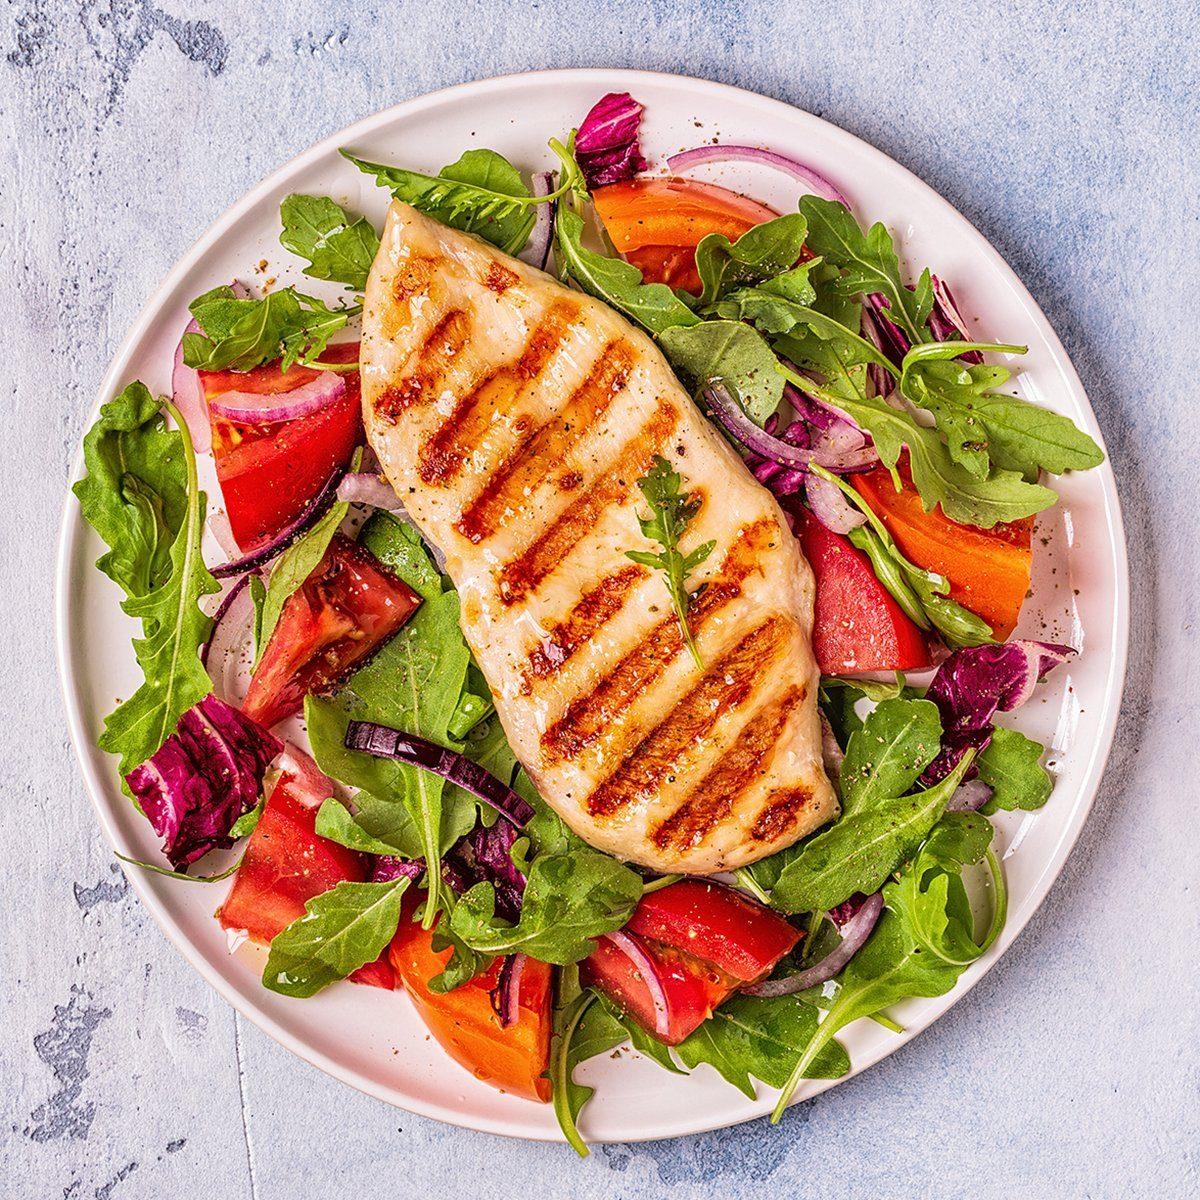 Chicken breast with fresh salad, top view.; Shutterstock ID 1254618559; Job (TFH, TOH, RD, BNB, CWM, CM): TOH